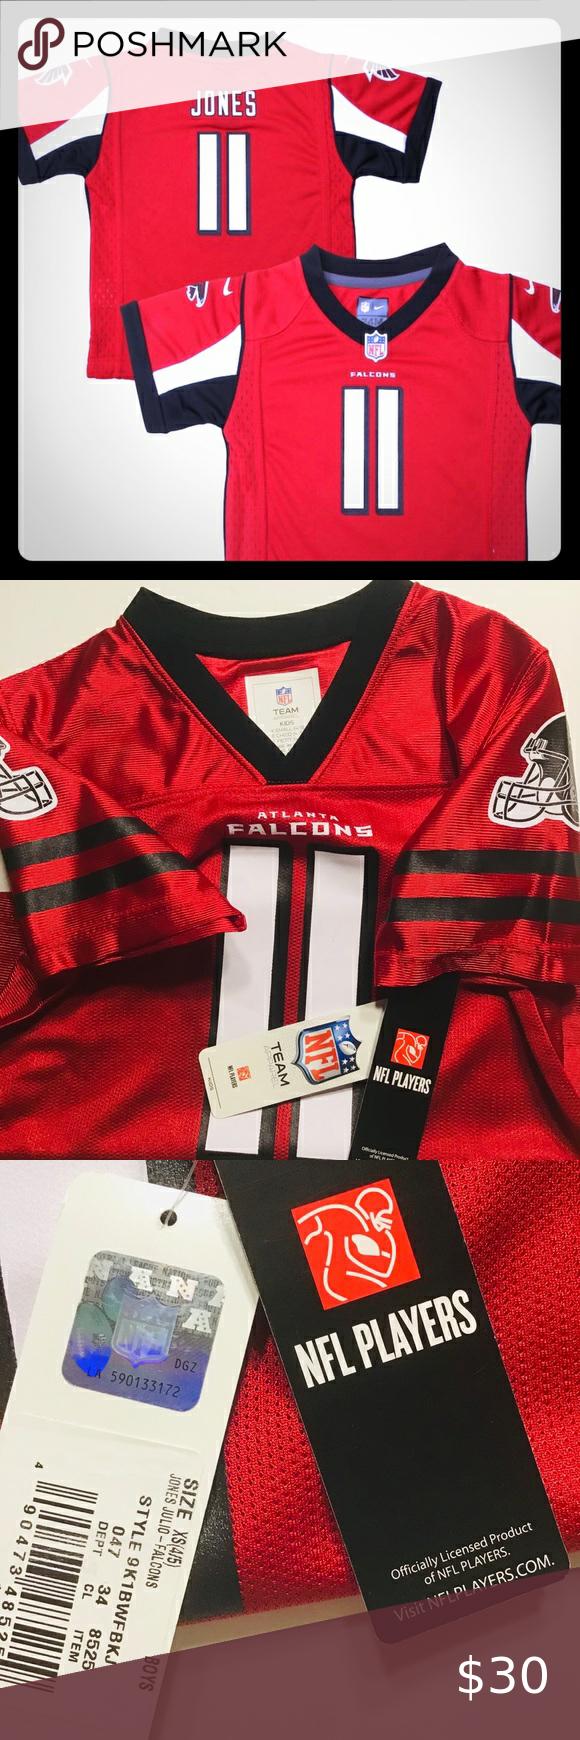 Bnwt Nfl Team Apparel Atlanta Falcons Jersey In 2020 Team Apparel Nfl Team Apparel Nfl Shirts